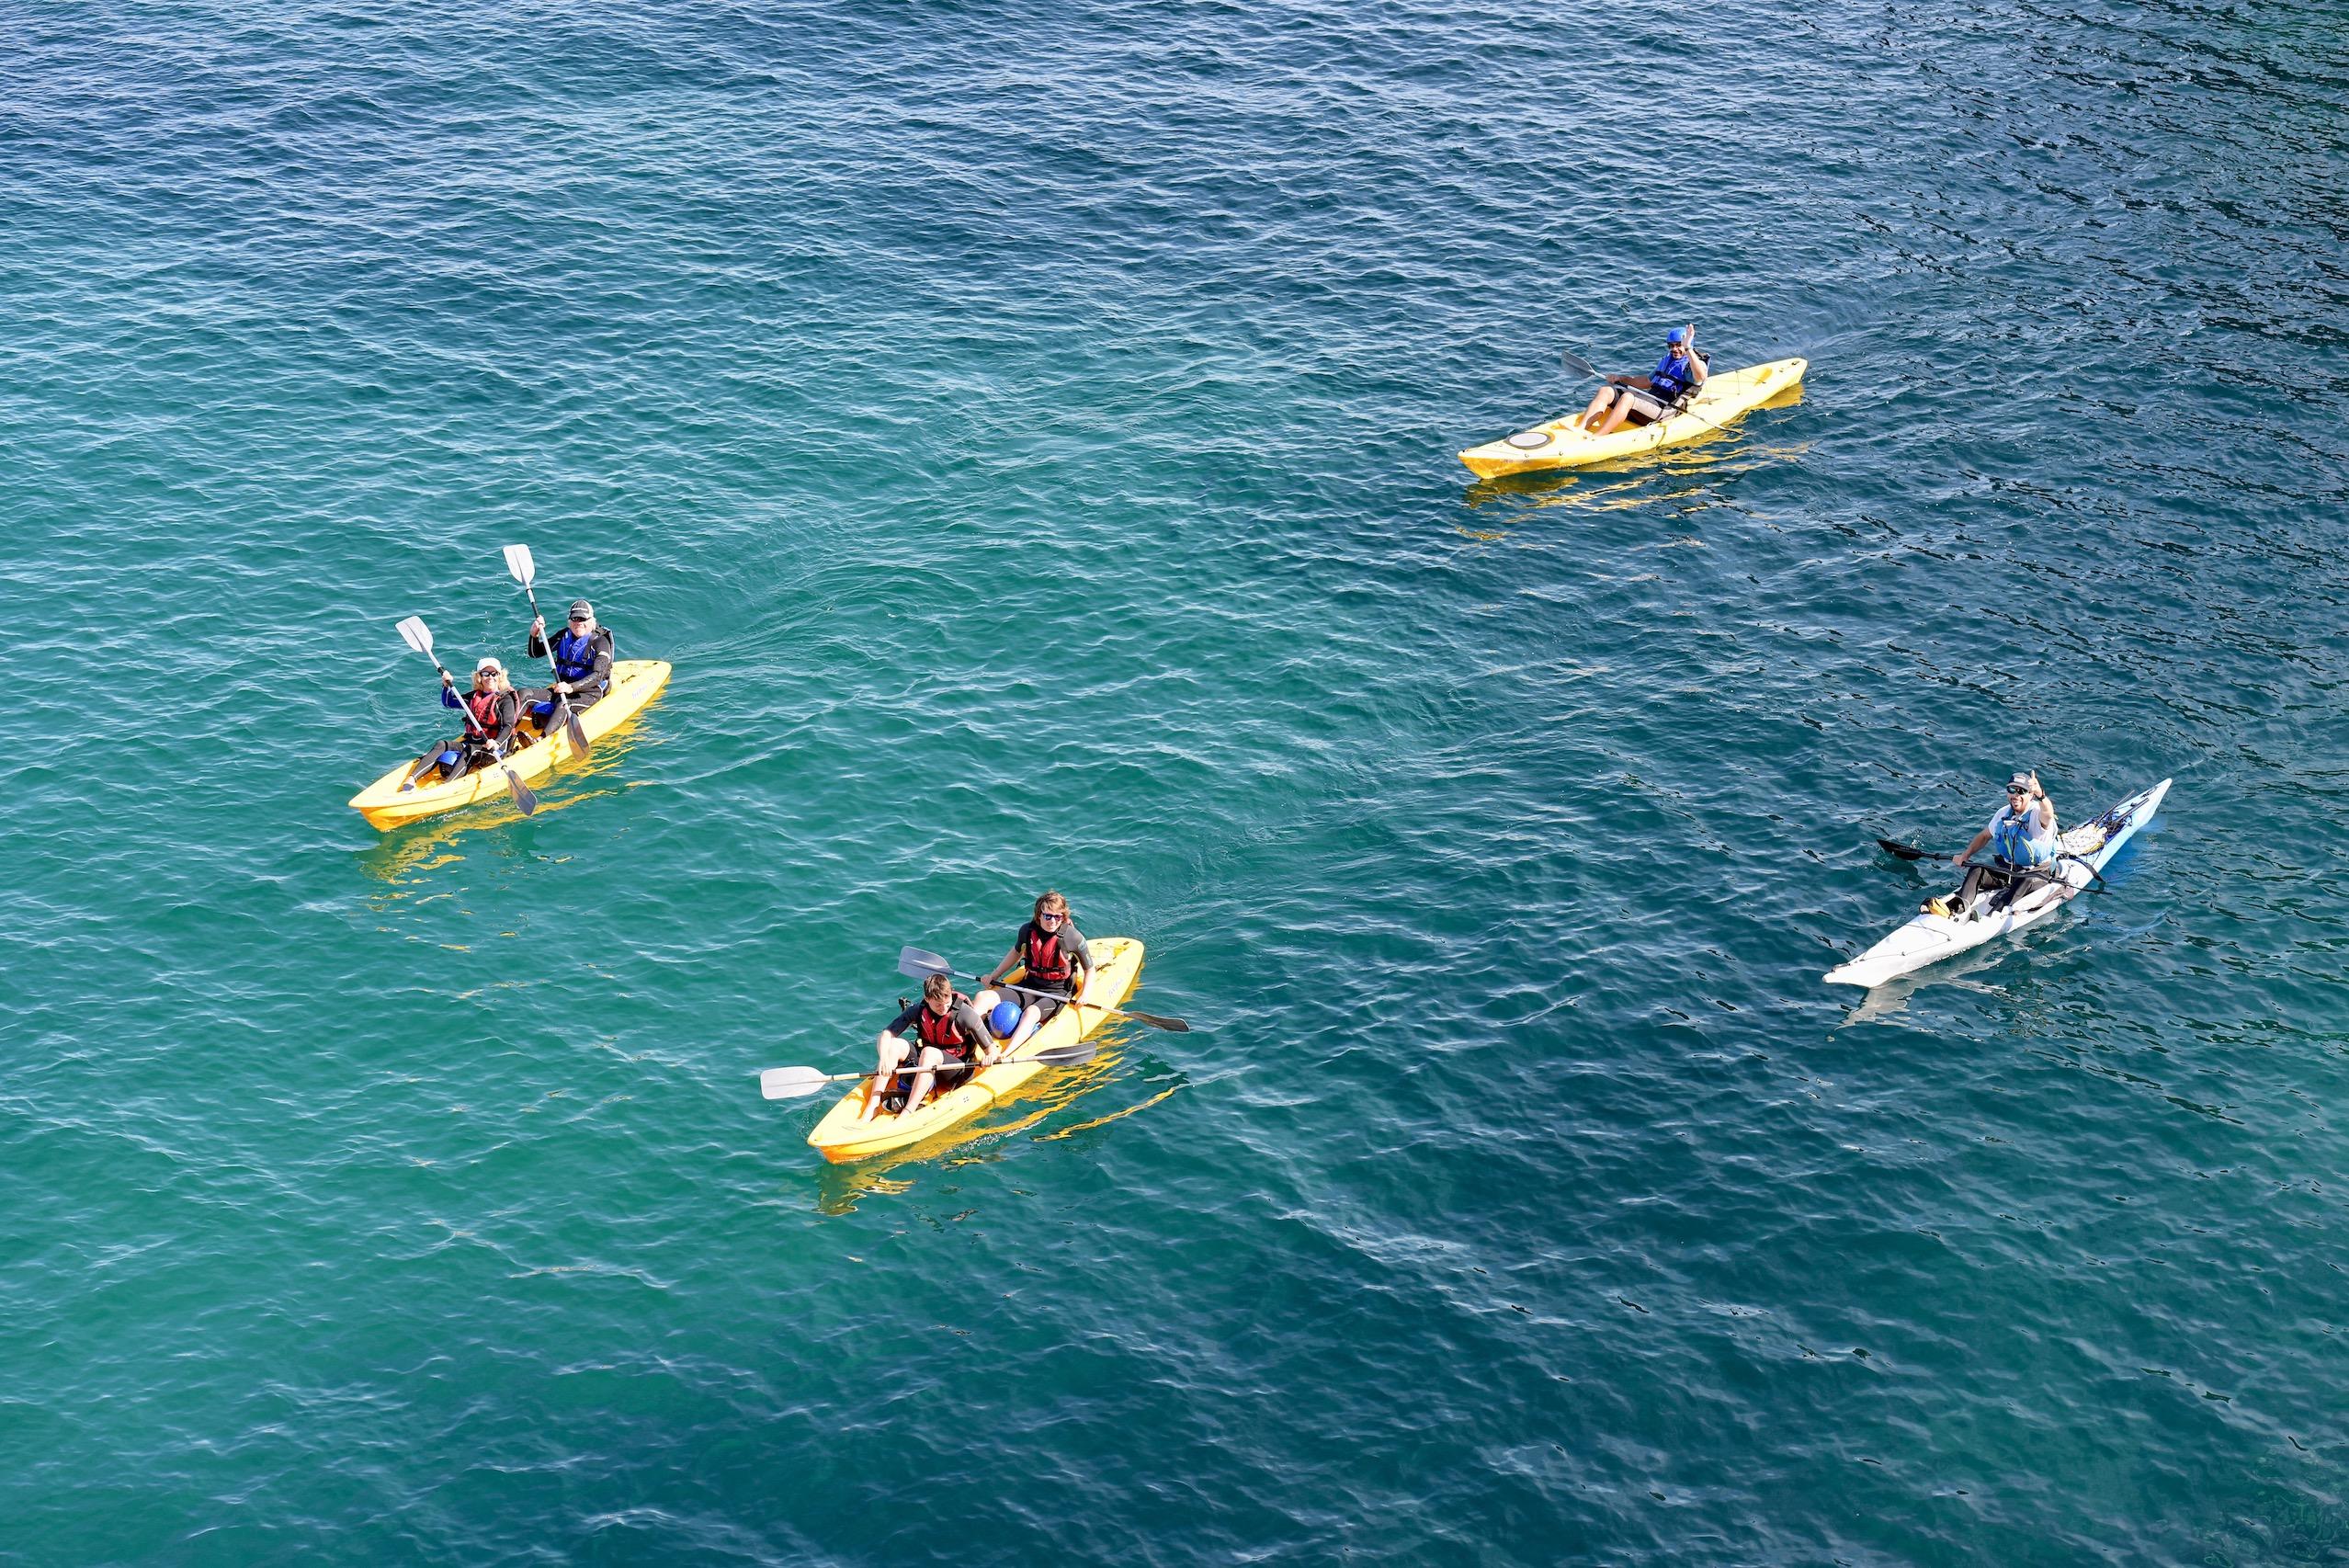 E.g. 'Kayak tours Cornwall' Port Quin